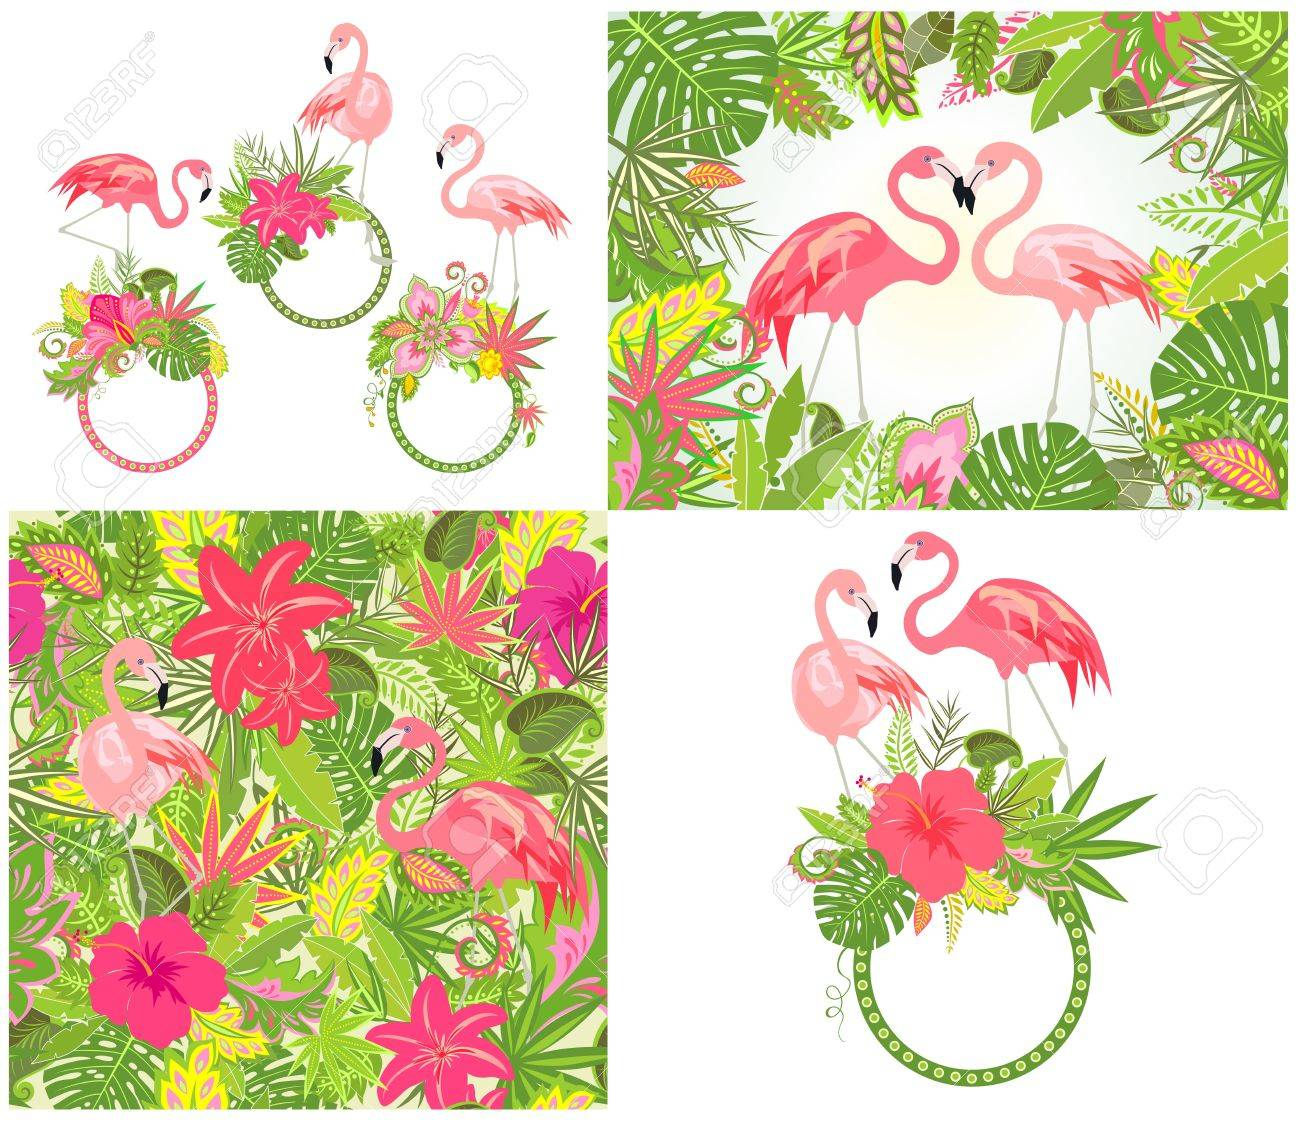 Hermoso Diseño De Boda Y Fondo De Pantalla Con Flores Exóticas ...